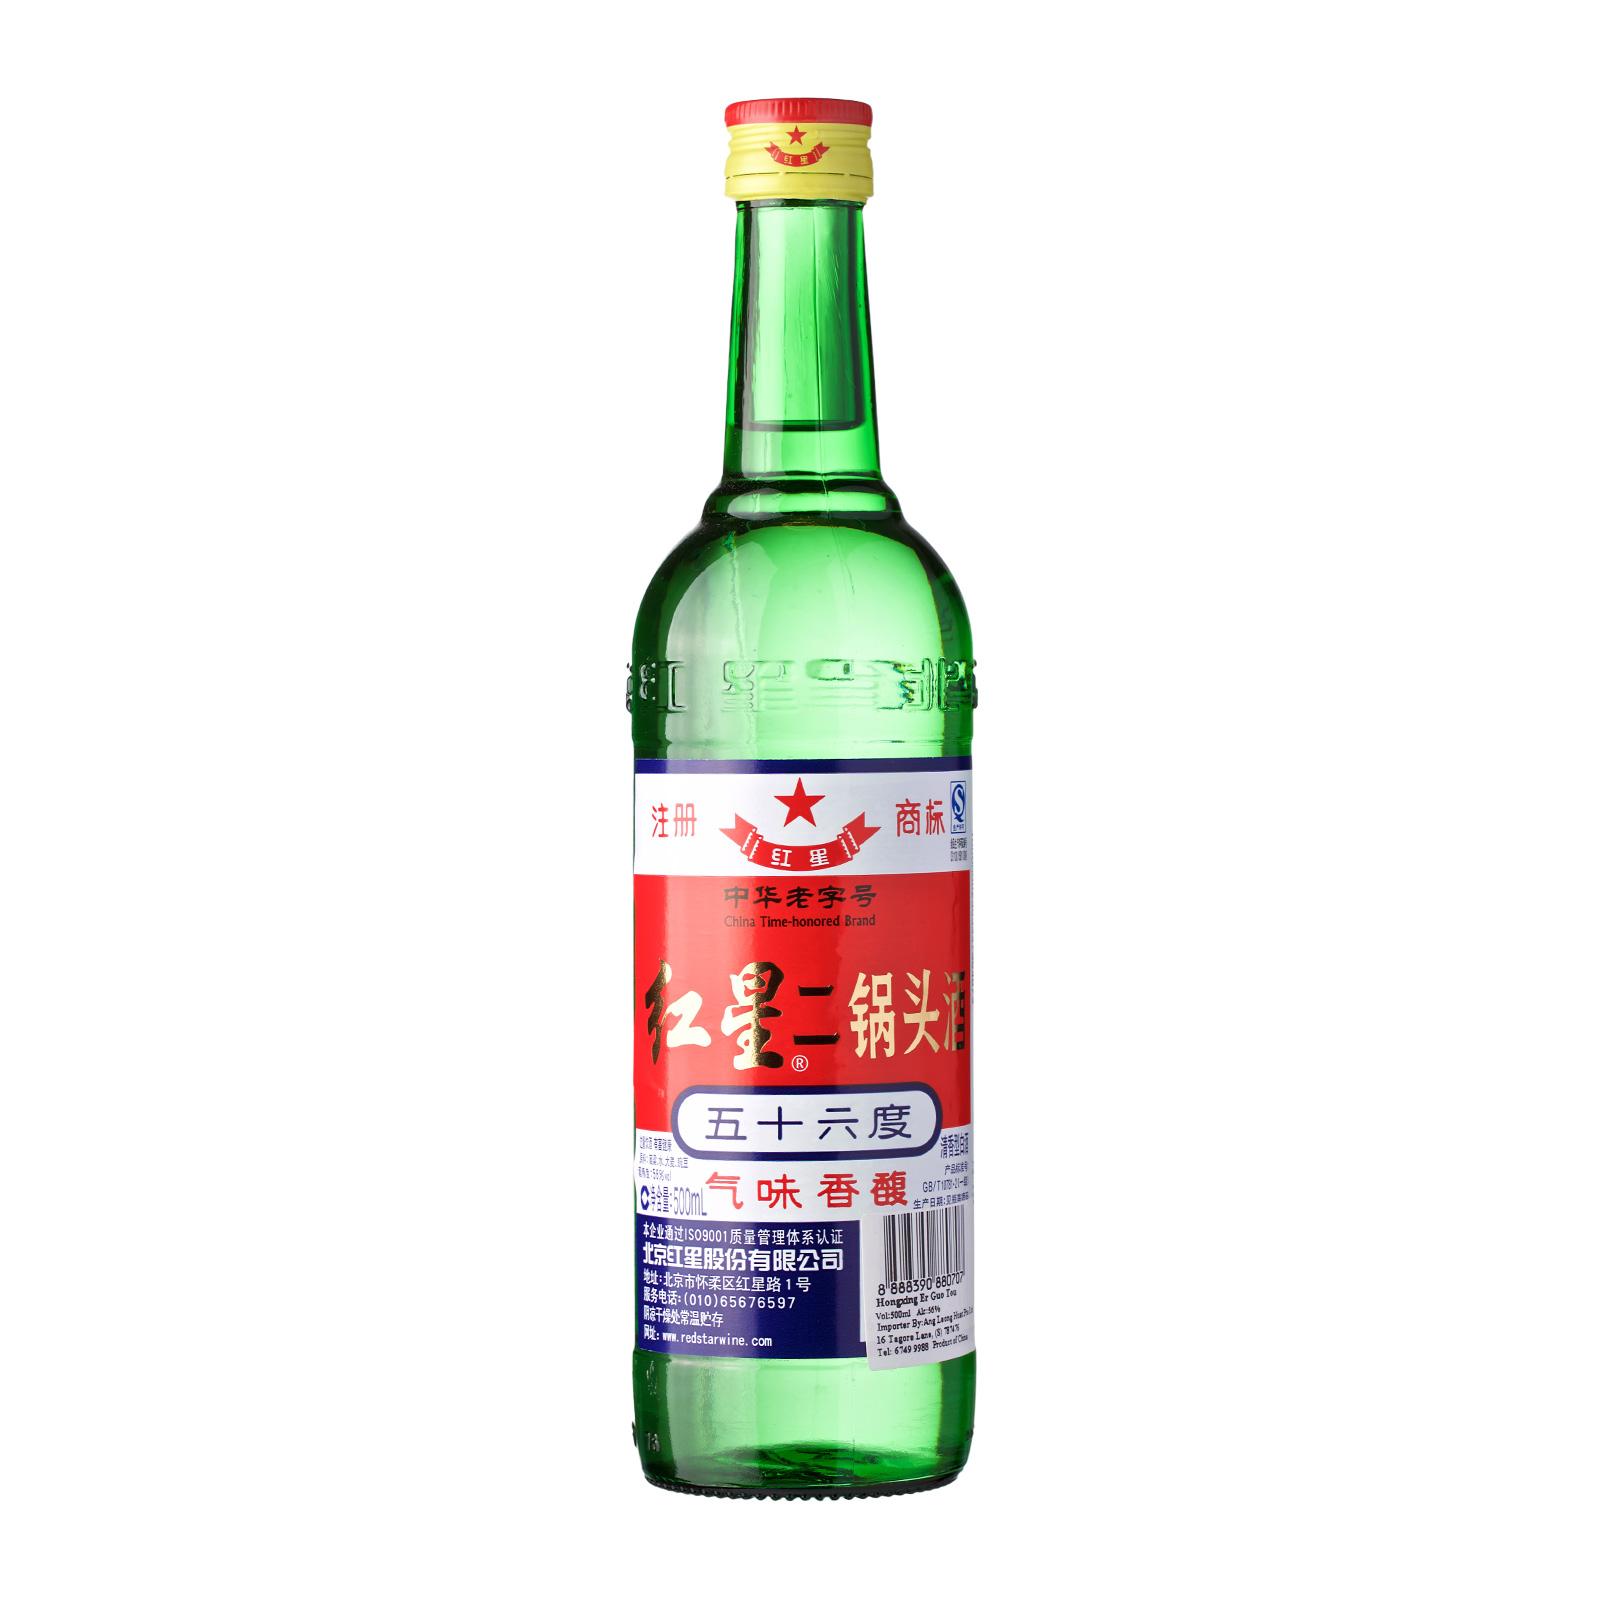 Red Star Erguotou